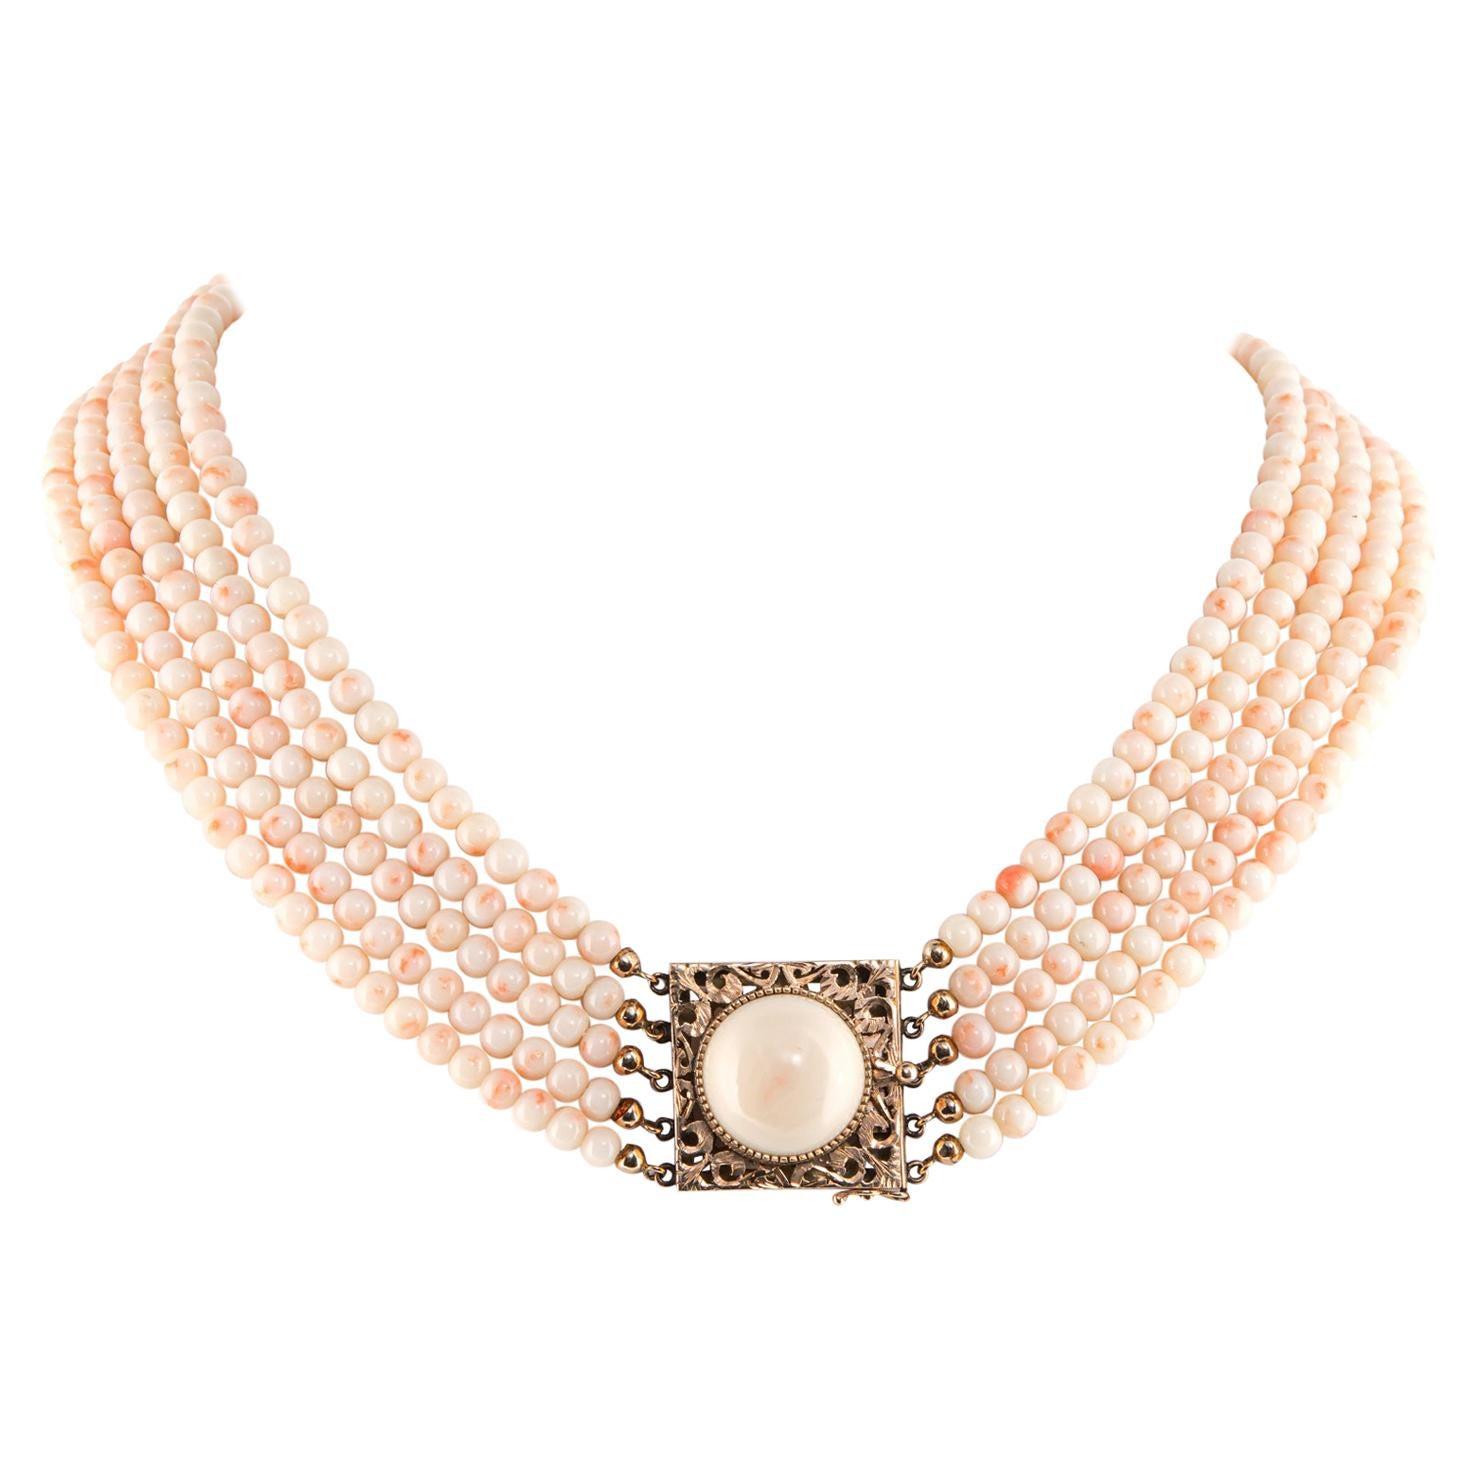 Vintage 5-Strand Angel Skin Coral Choker Necklace Multi Strand Jewelry